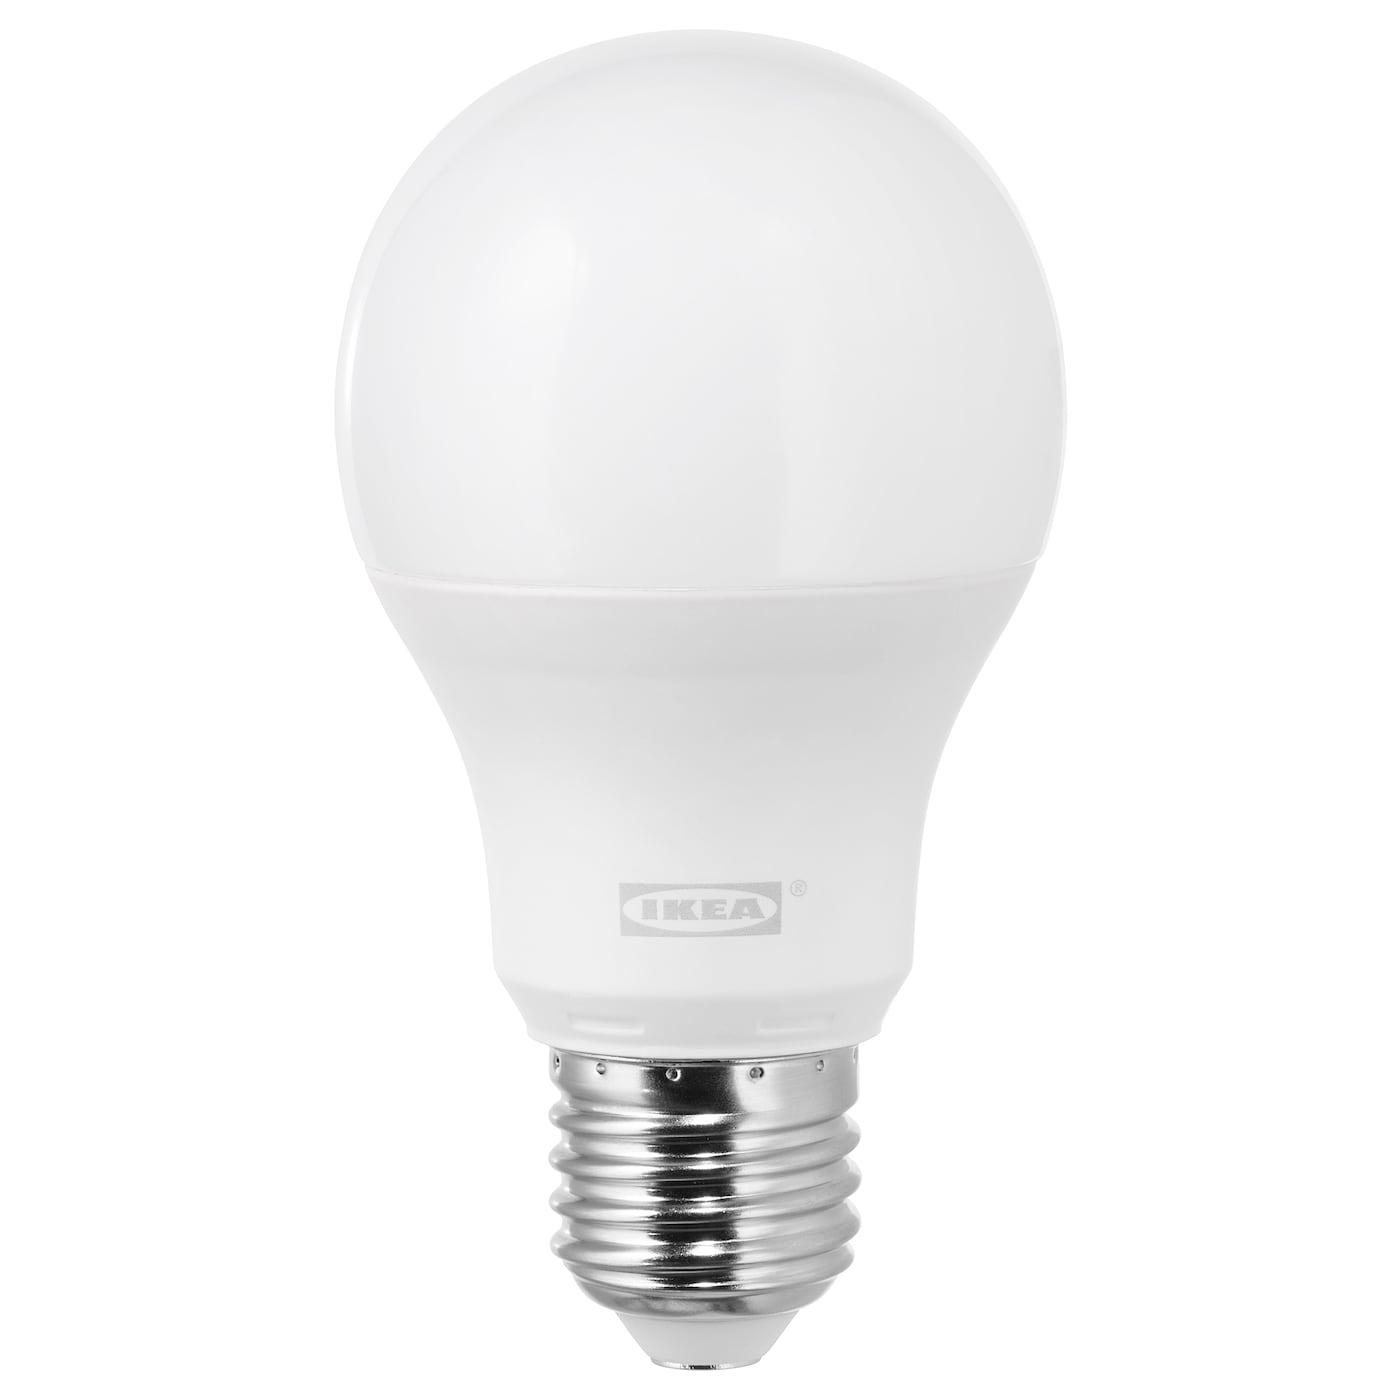 ledare ampoule led e27 1000 lumen lumière chaude/globe opalin - ikea